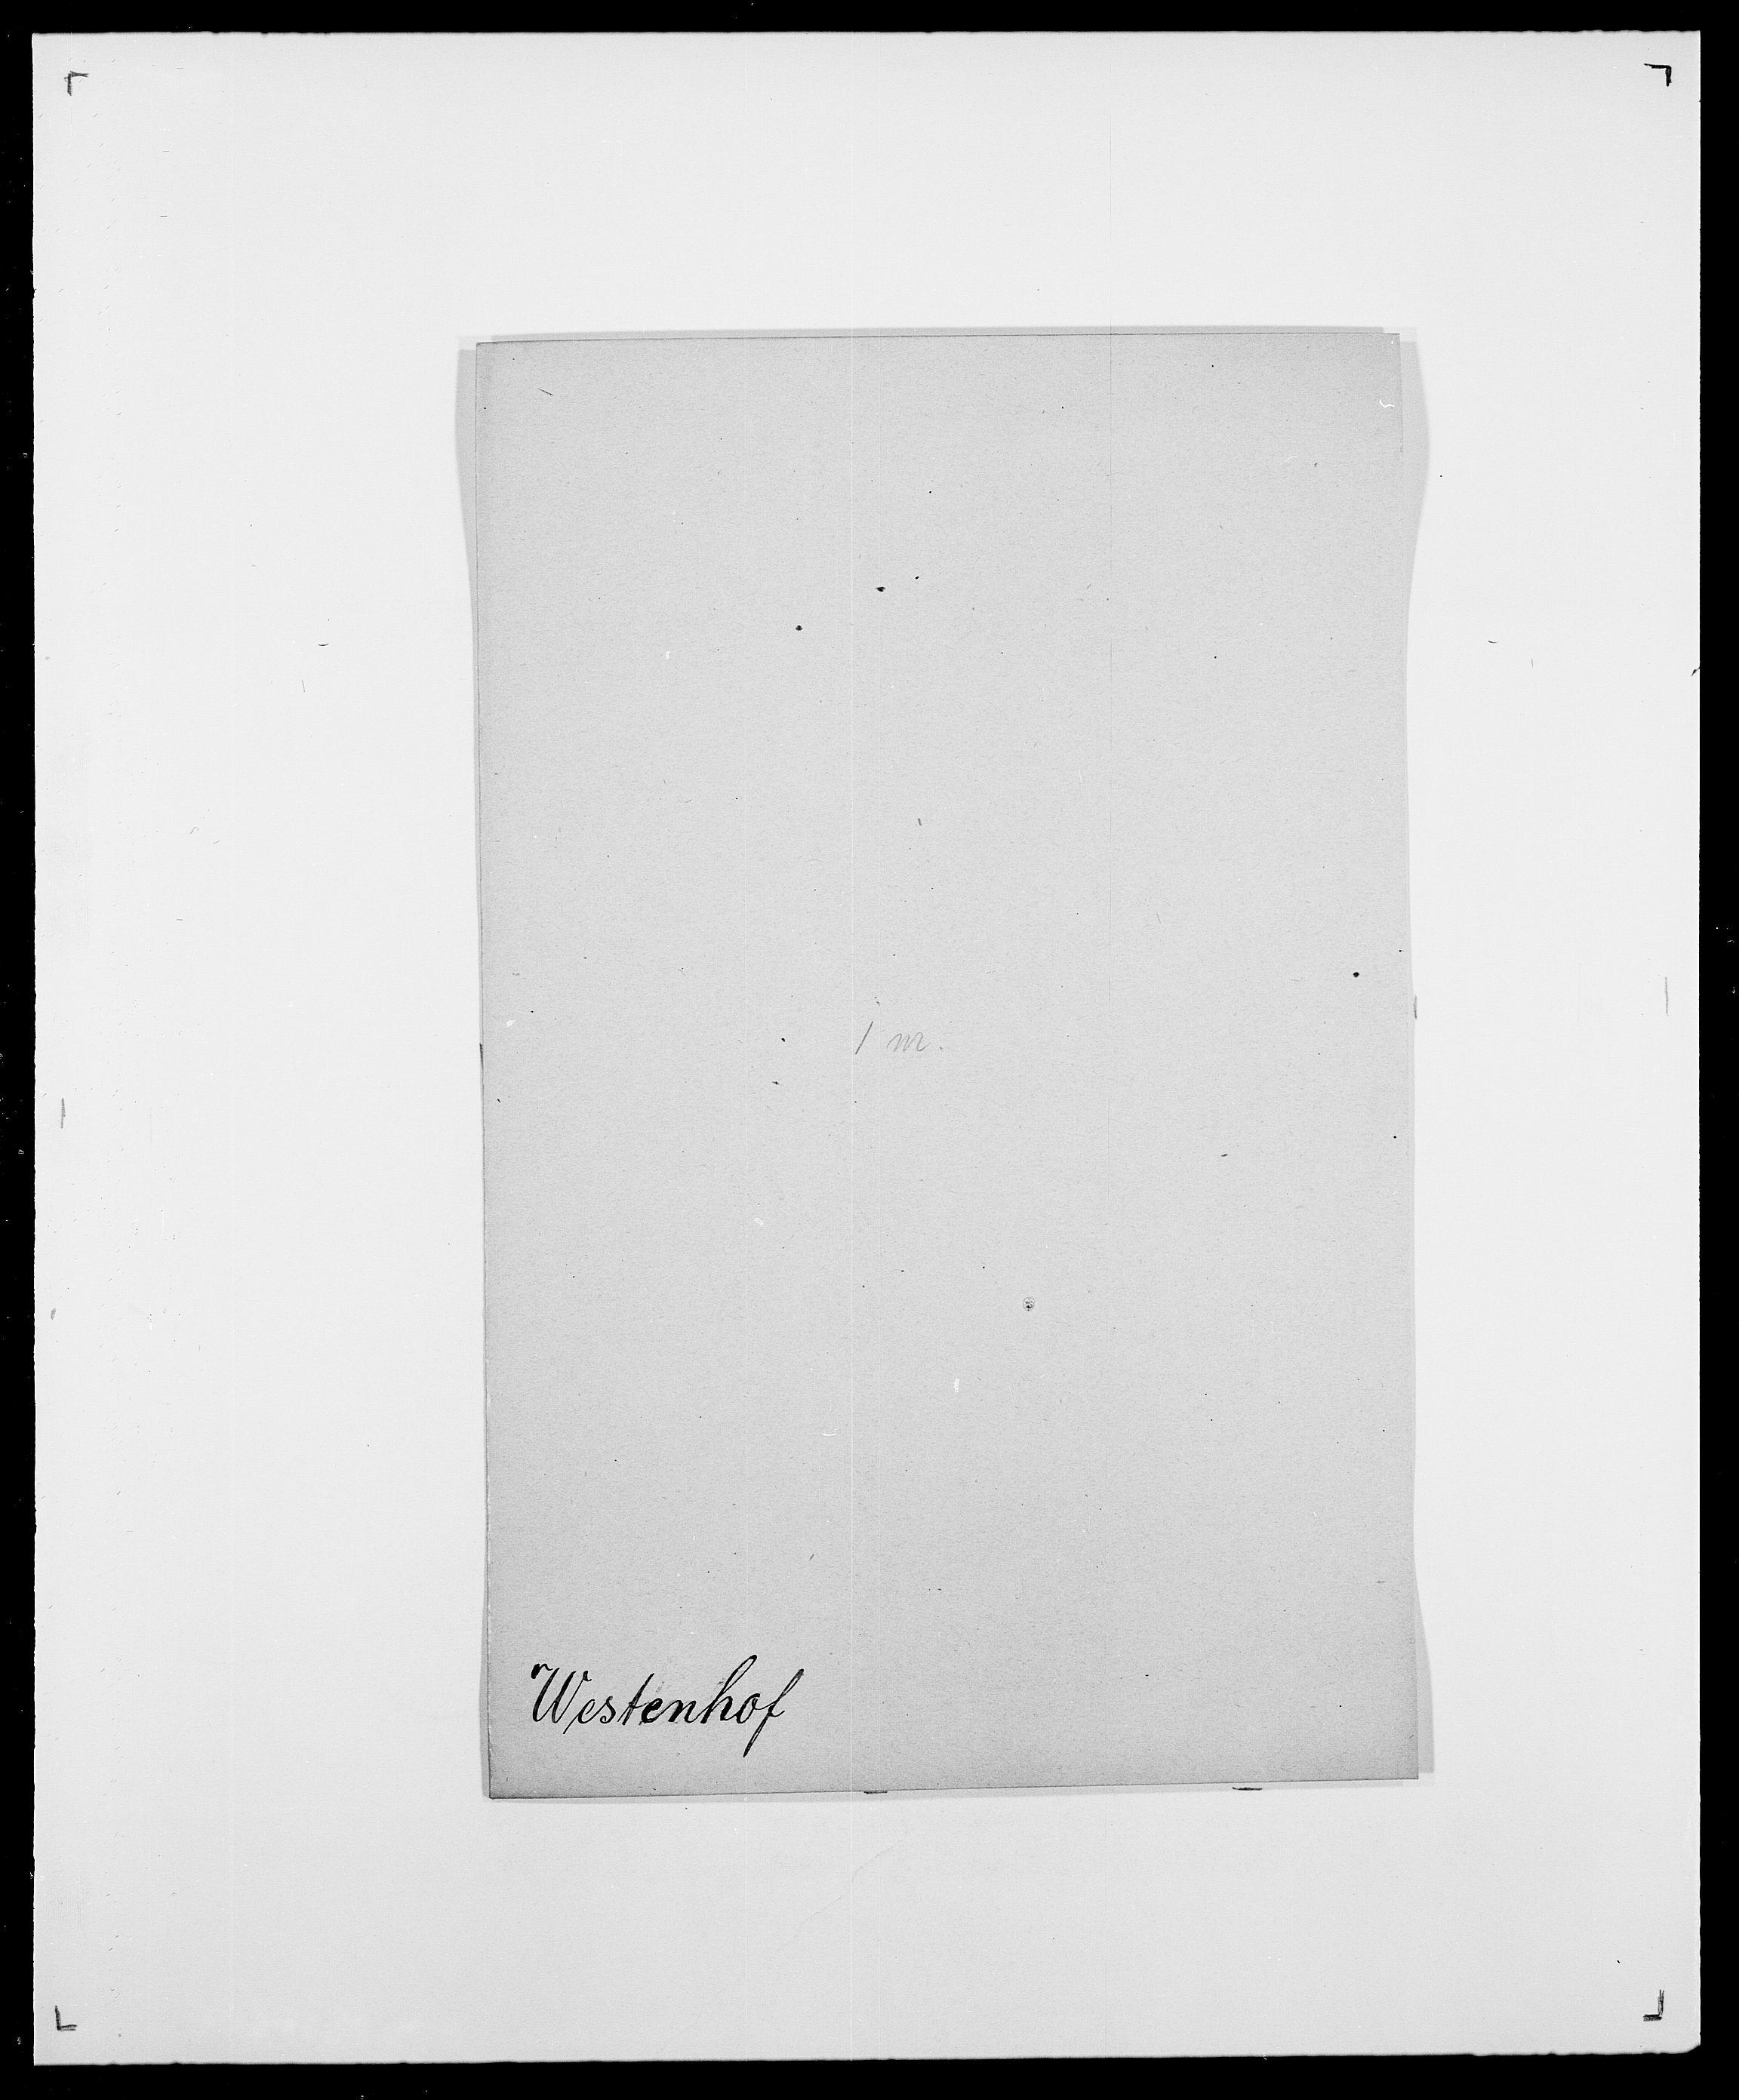 SAO, Delgobe, Charles Antoine - samling, D/Da/L0041: Vemmestad - Viker, s. 261